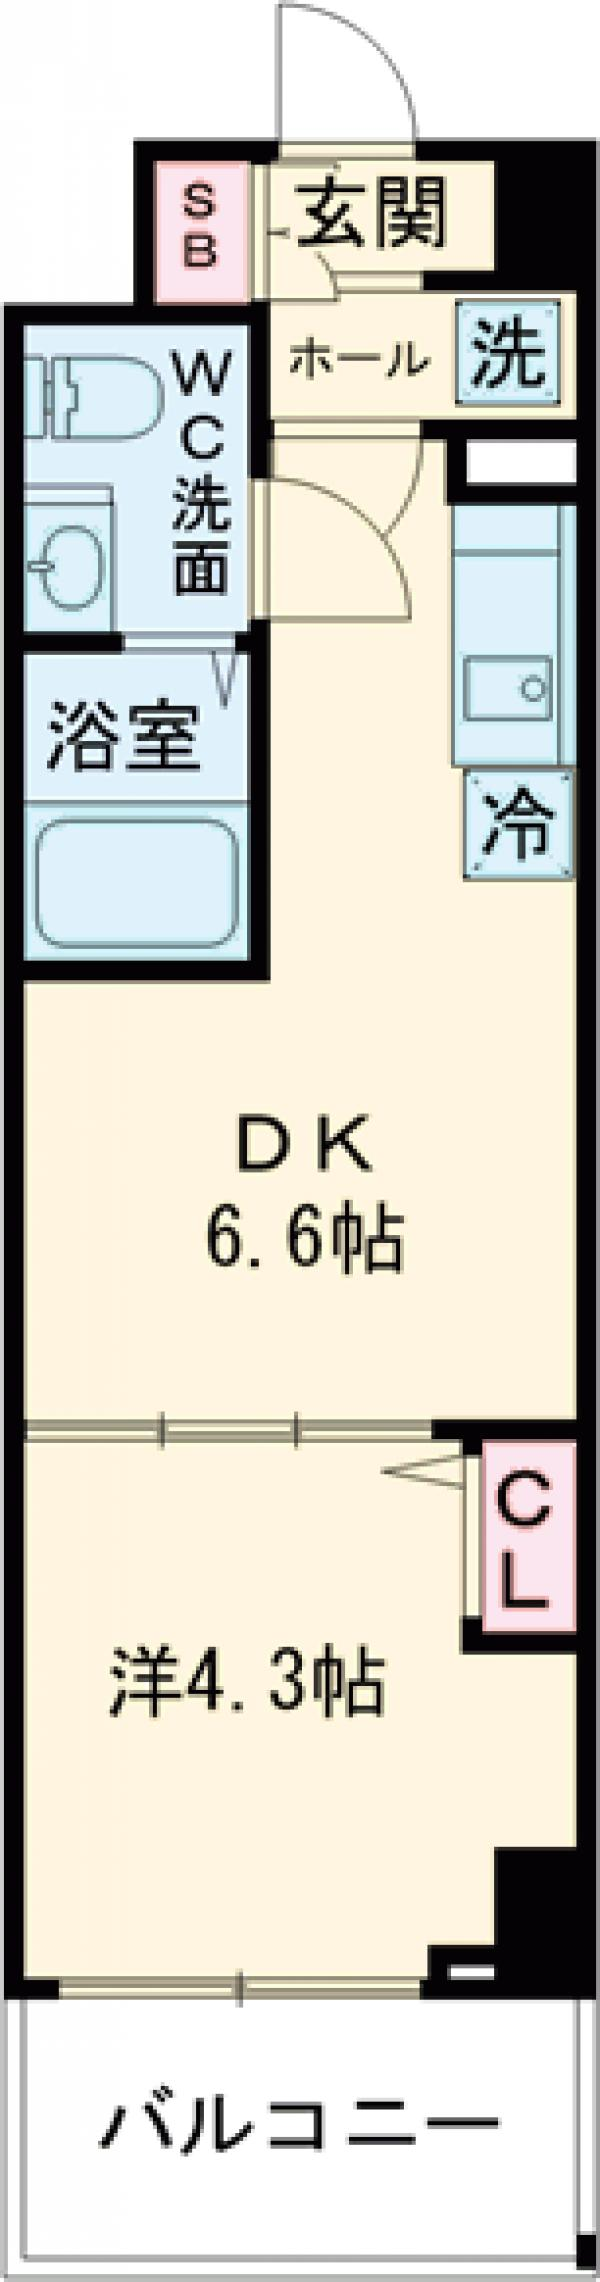 KDXレジデンス梅島・508号室の間取り